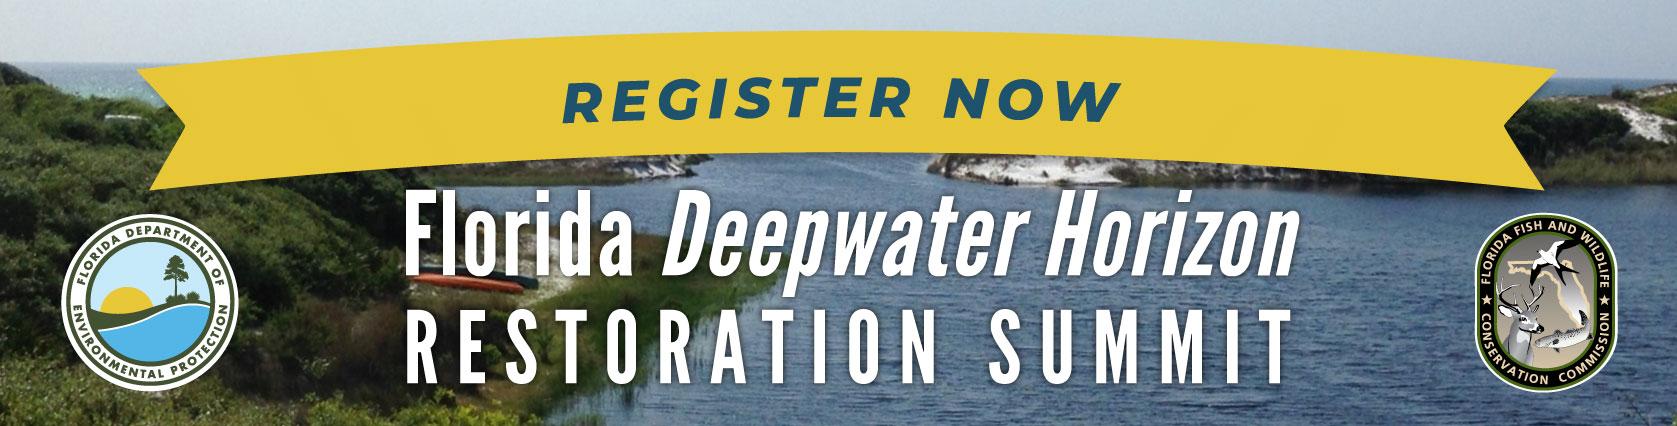 Register Now for the Deepwater Horizon Restoration Summit